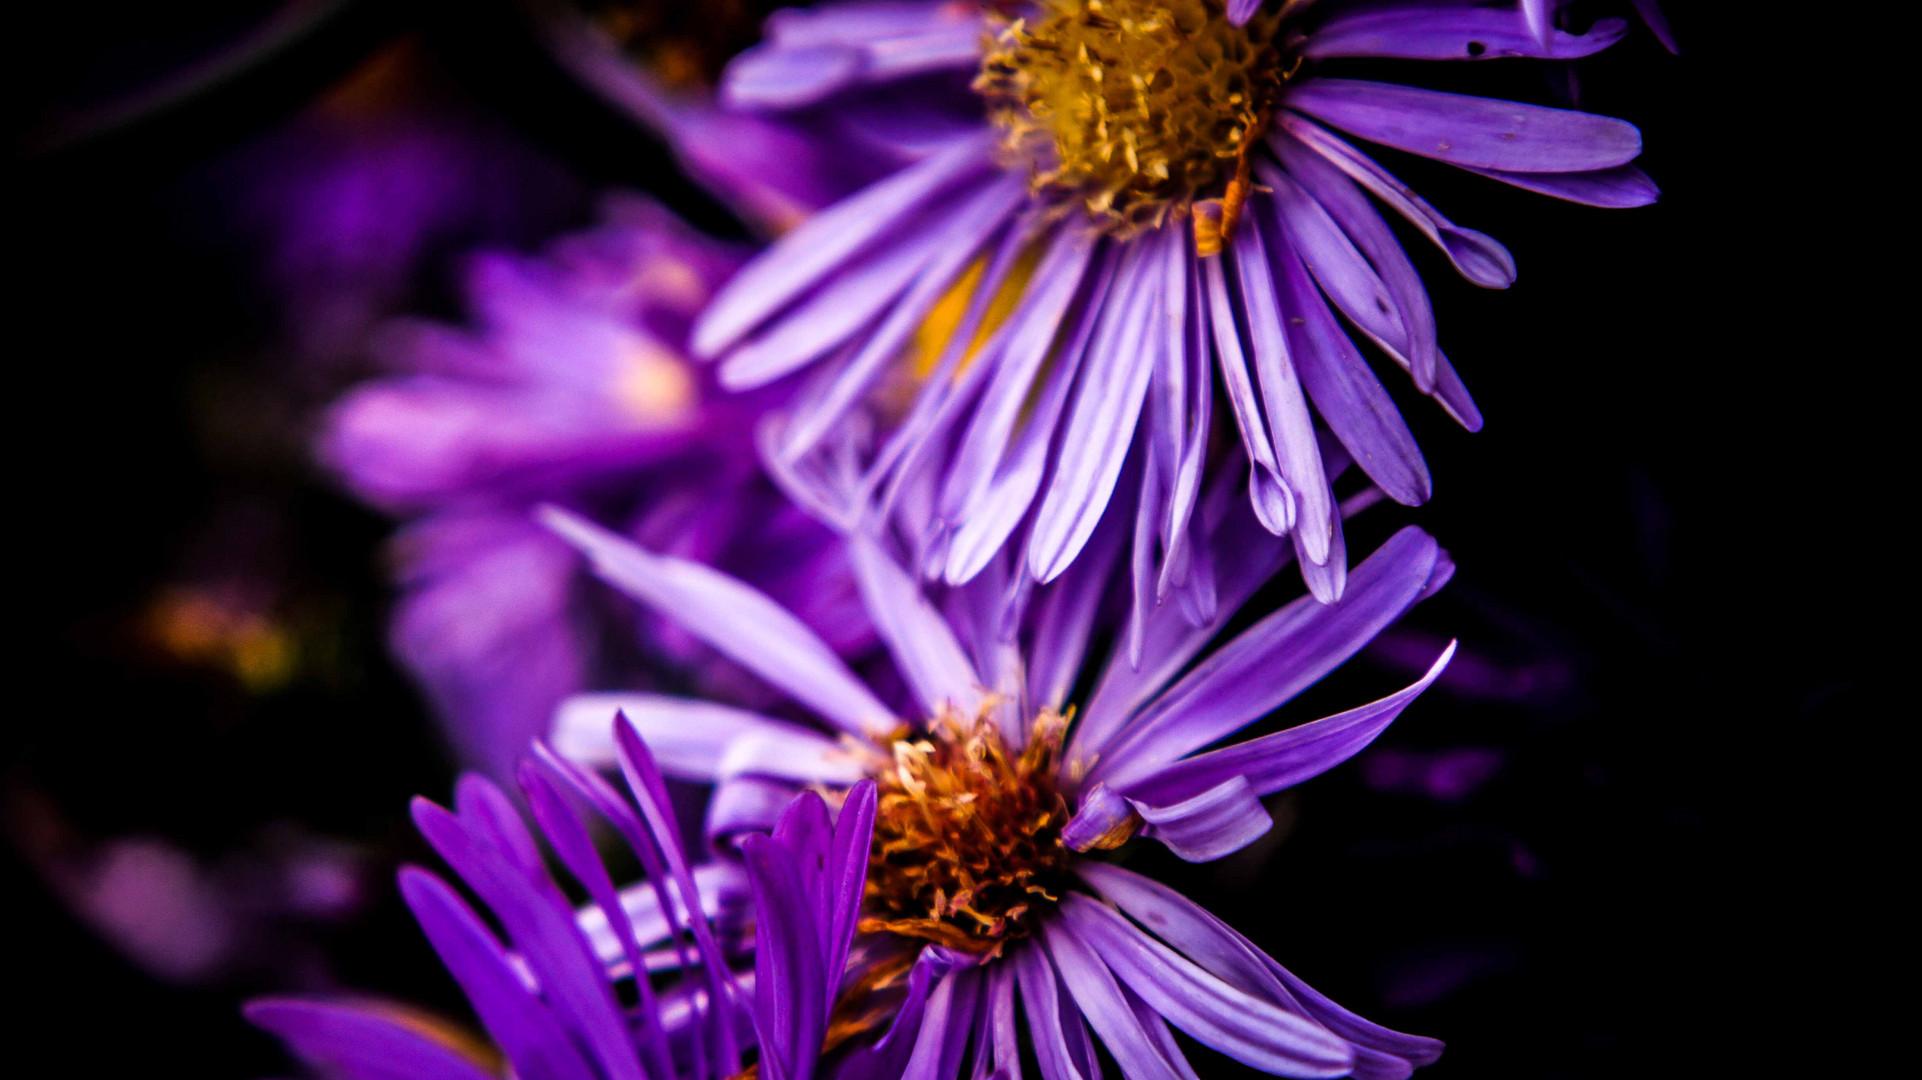 Blütenblätter im Großformat